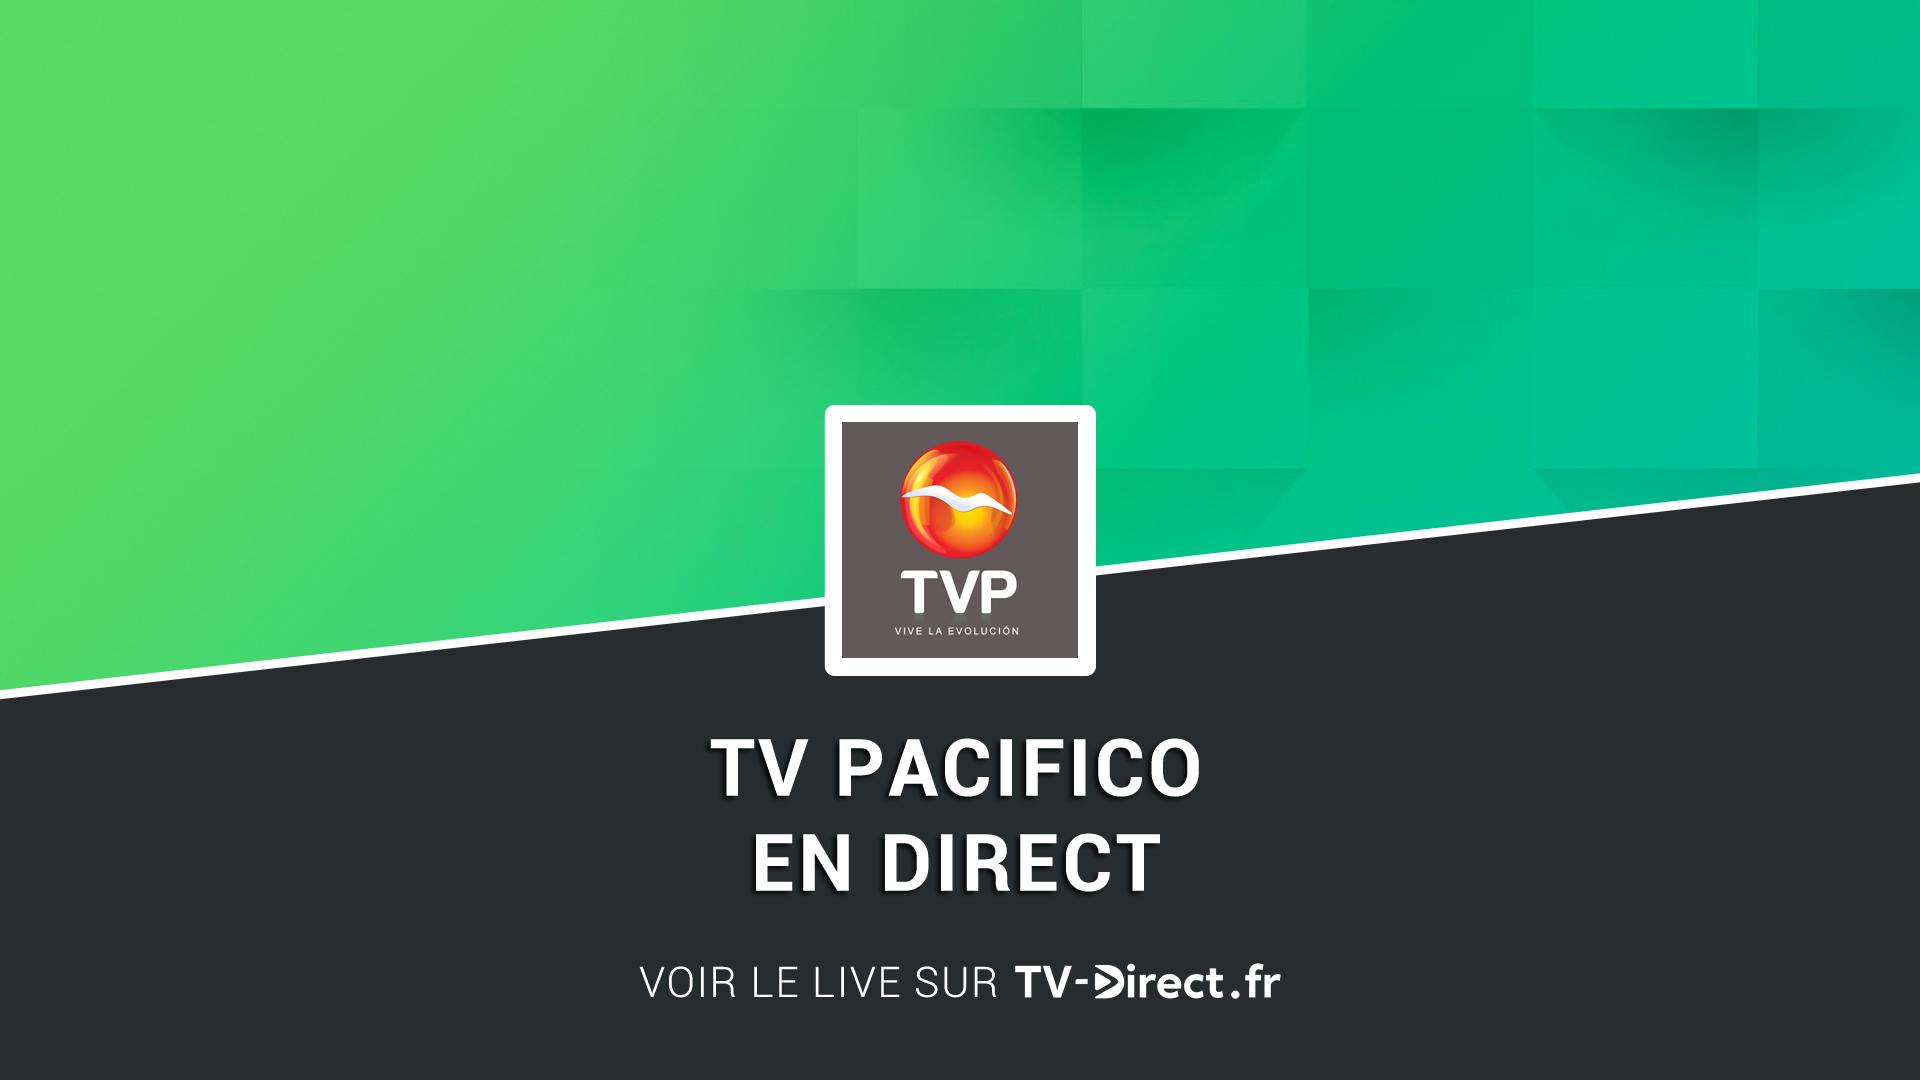 tv pacifico direct regarder tv pacifico live sur internet. Black Bedroom Furniture Sets. Home Design Ideas